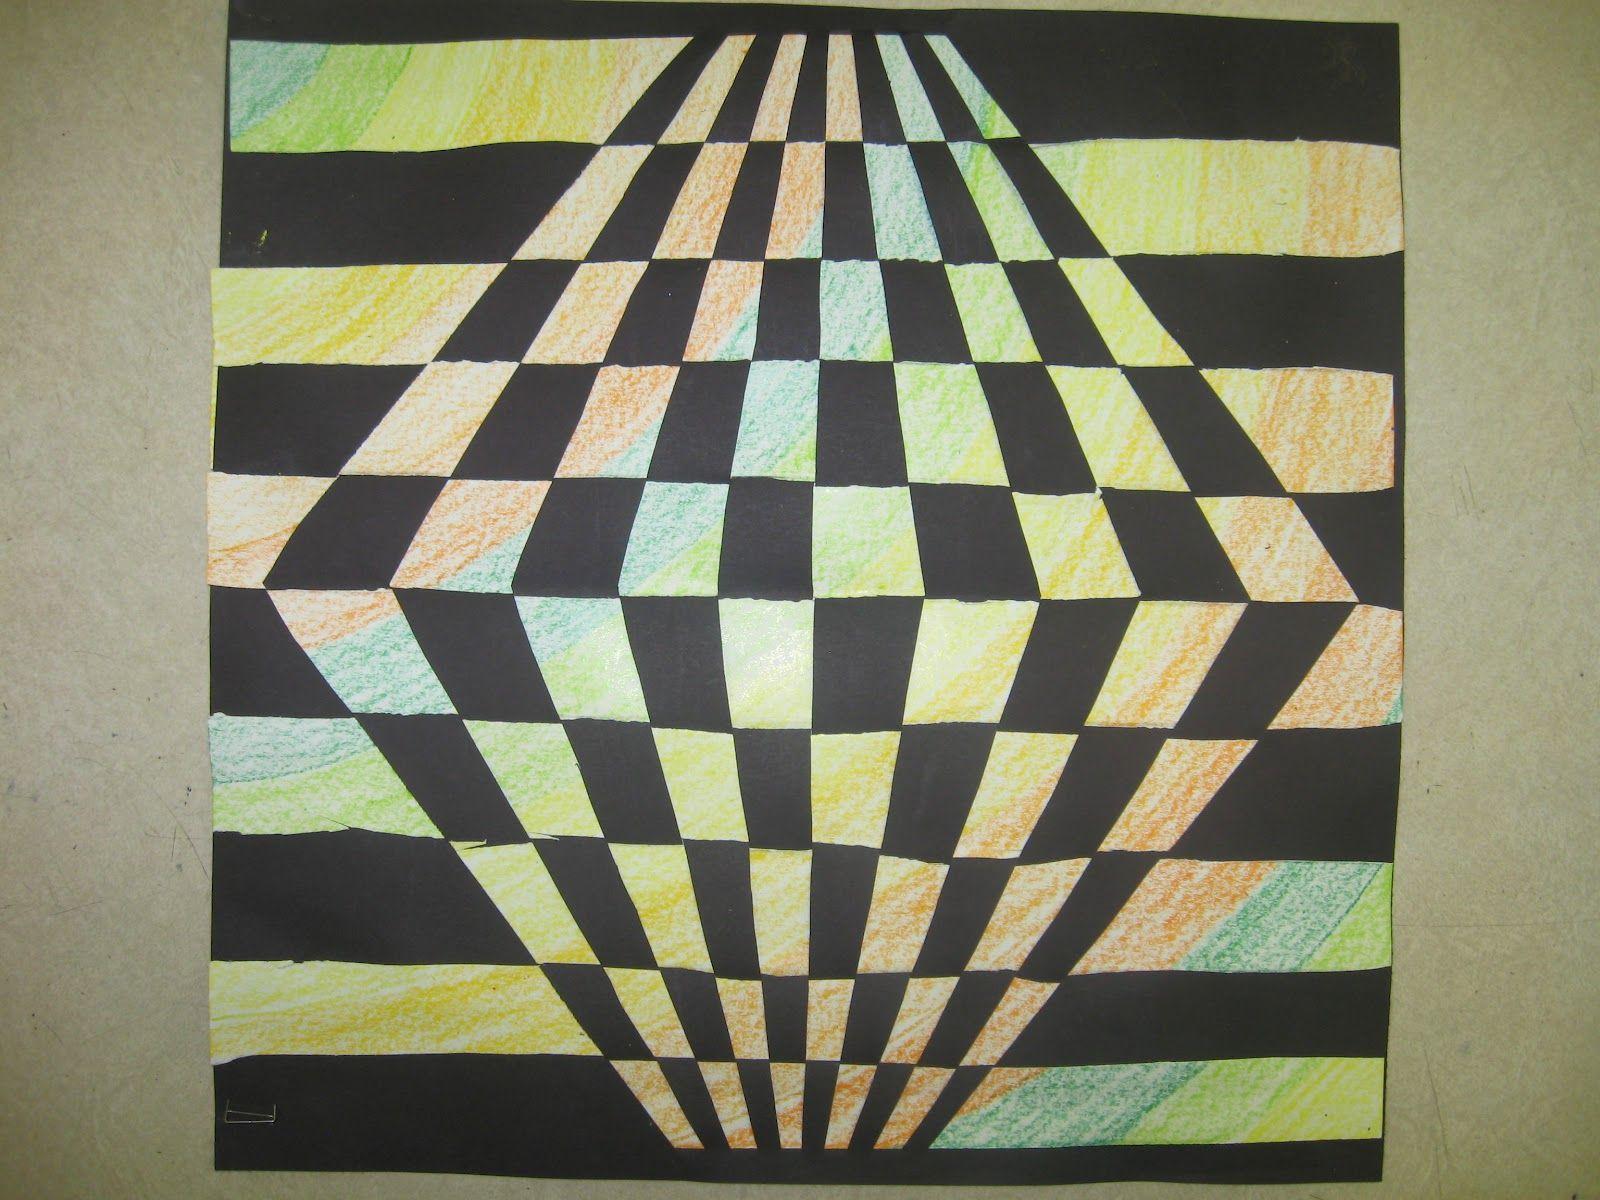 Op art uses color to create - Miss Young S Art Room 6th Grade Op Art Paper Weaving